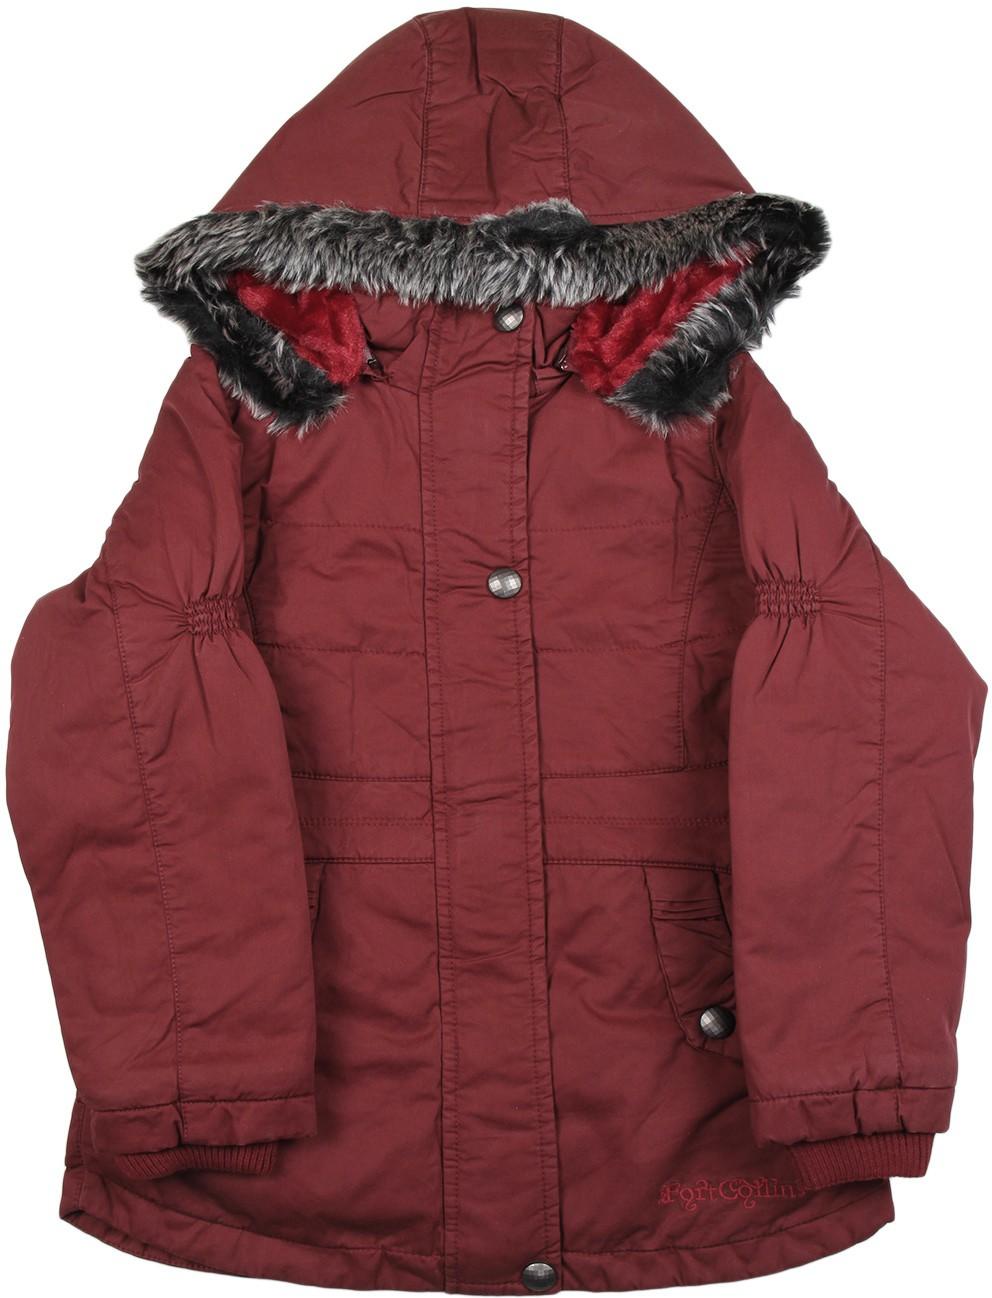 Deals | Winter wear Fort Collins, UCB...